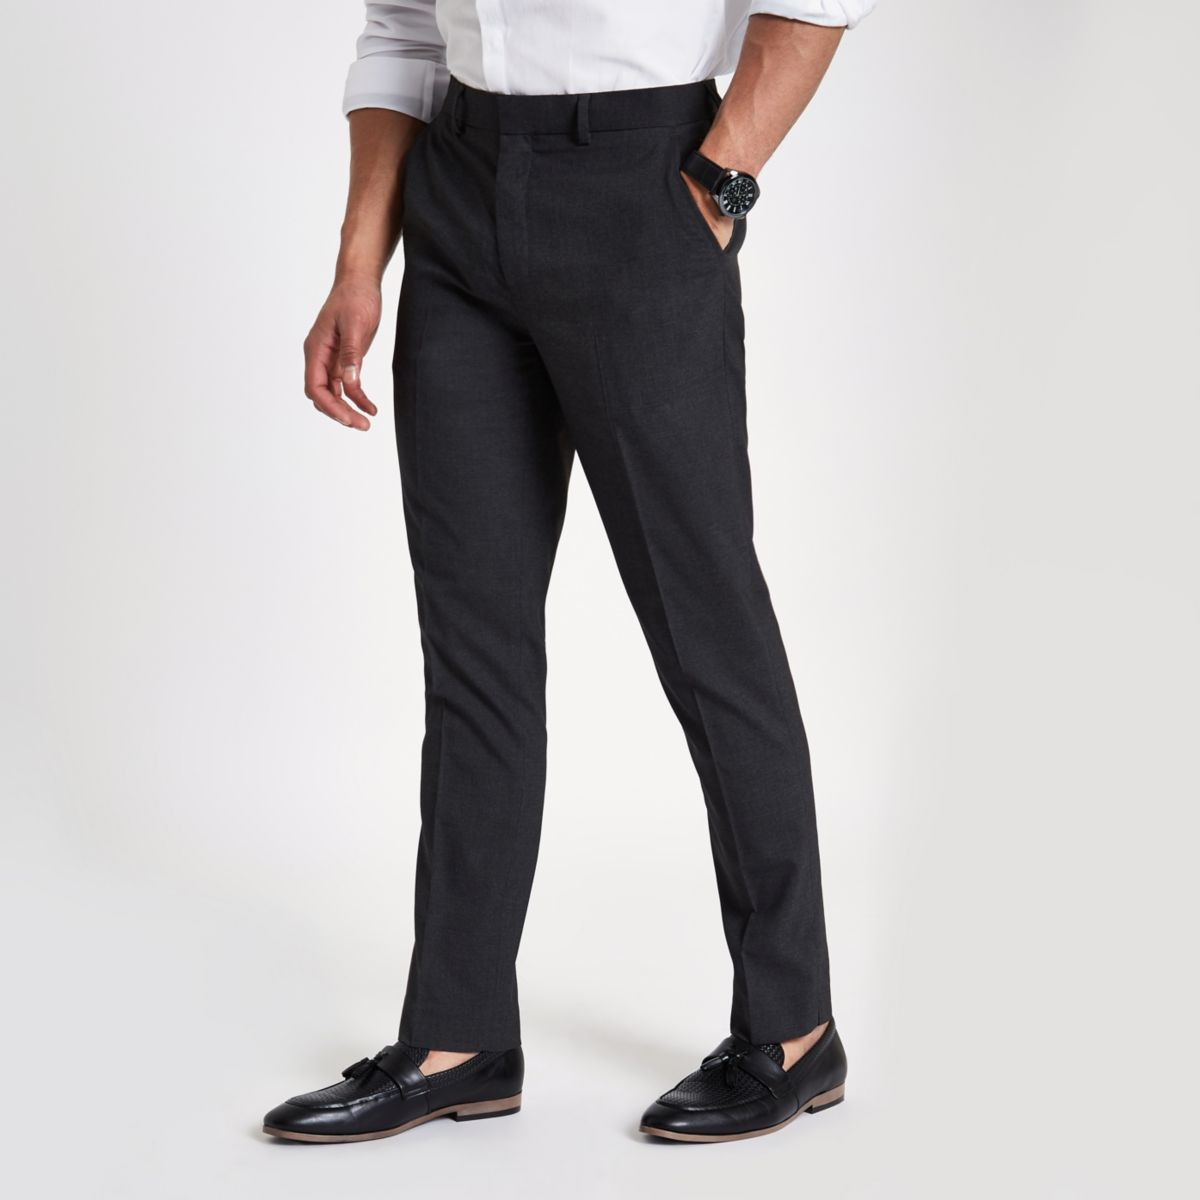 pantalon habill slim gris pantalons habill s. Black Bedroom Furniture Sets. Home Design Ideas